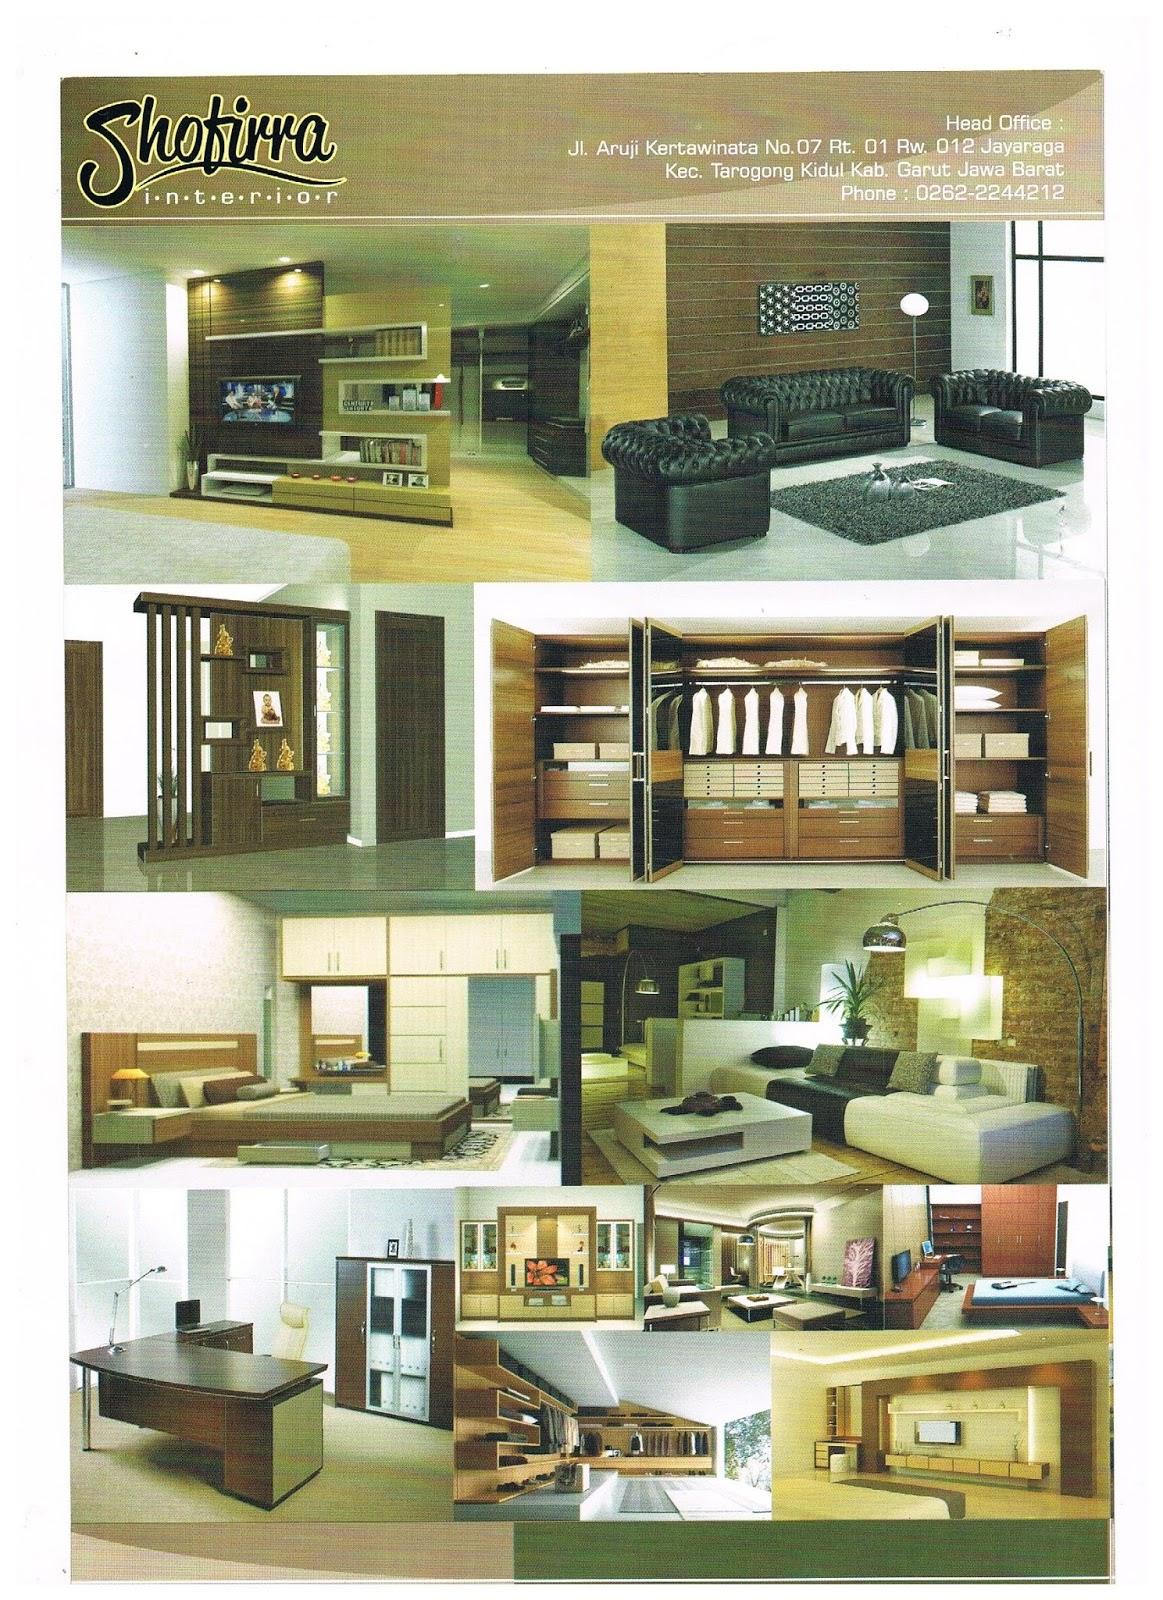 Shofirra Interior Furniture